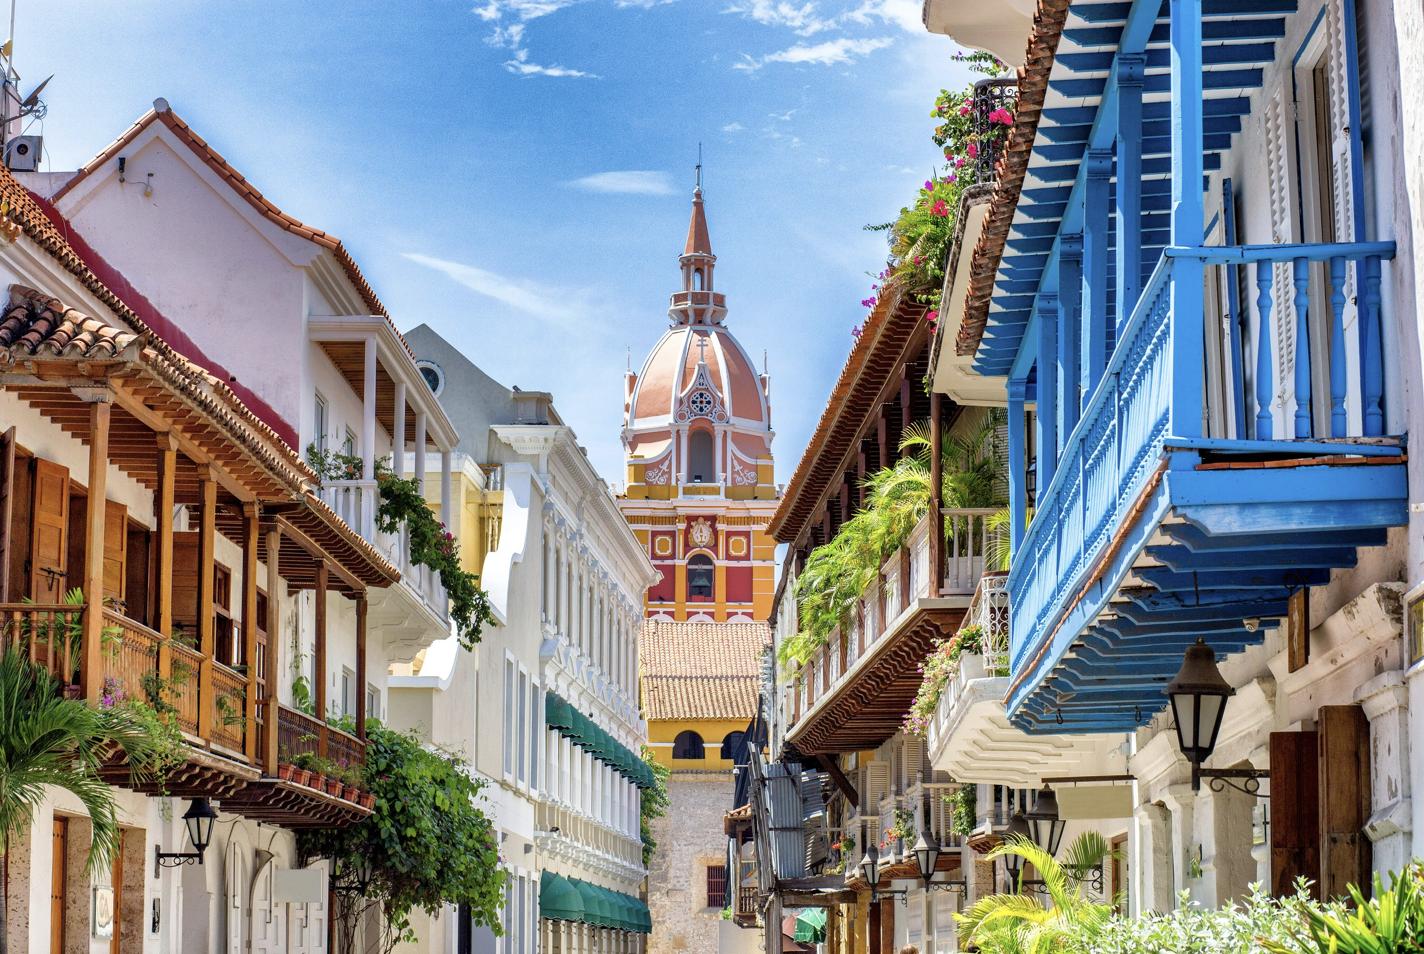 Cartagena is a beautiful city